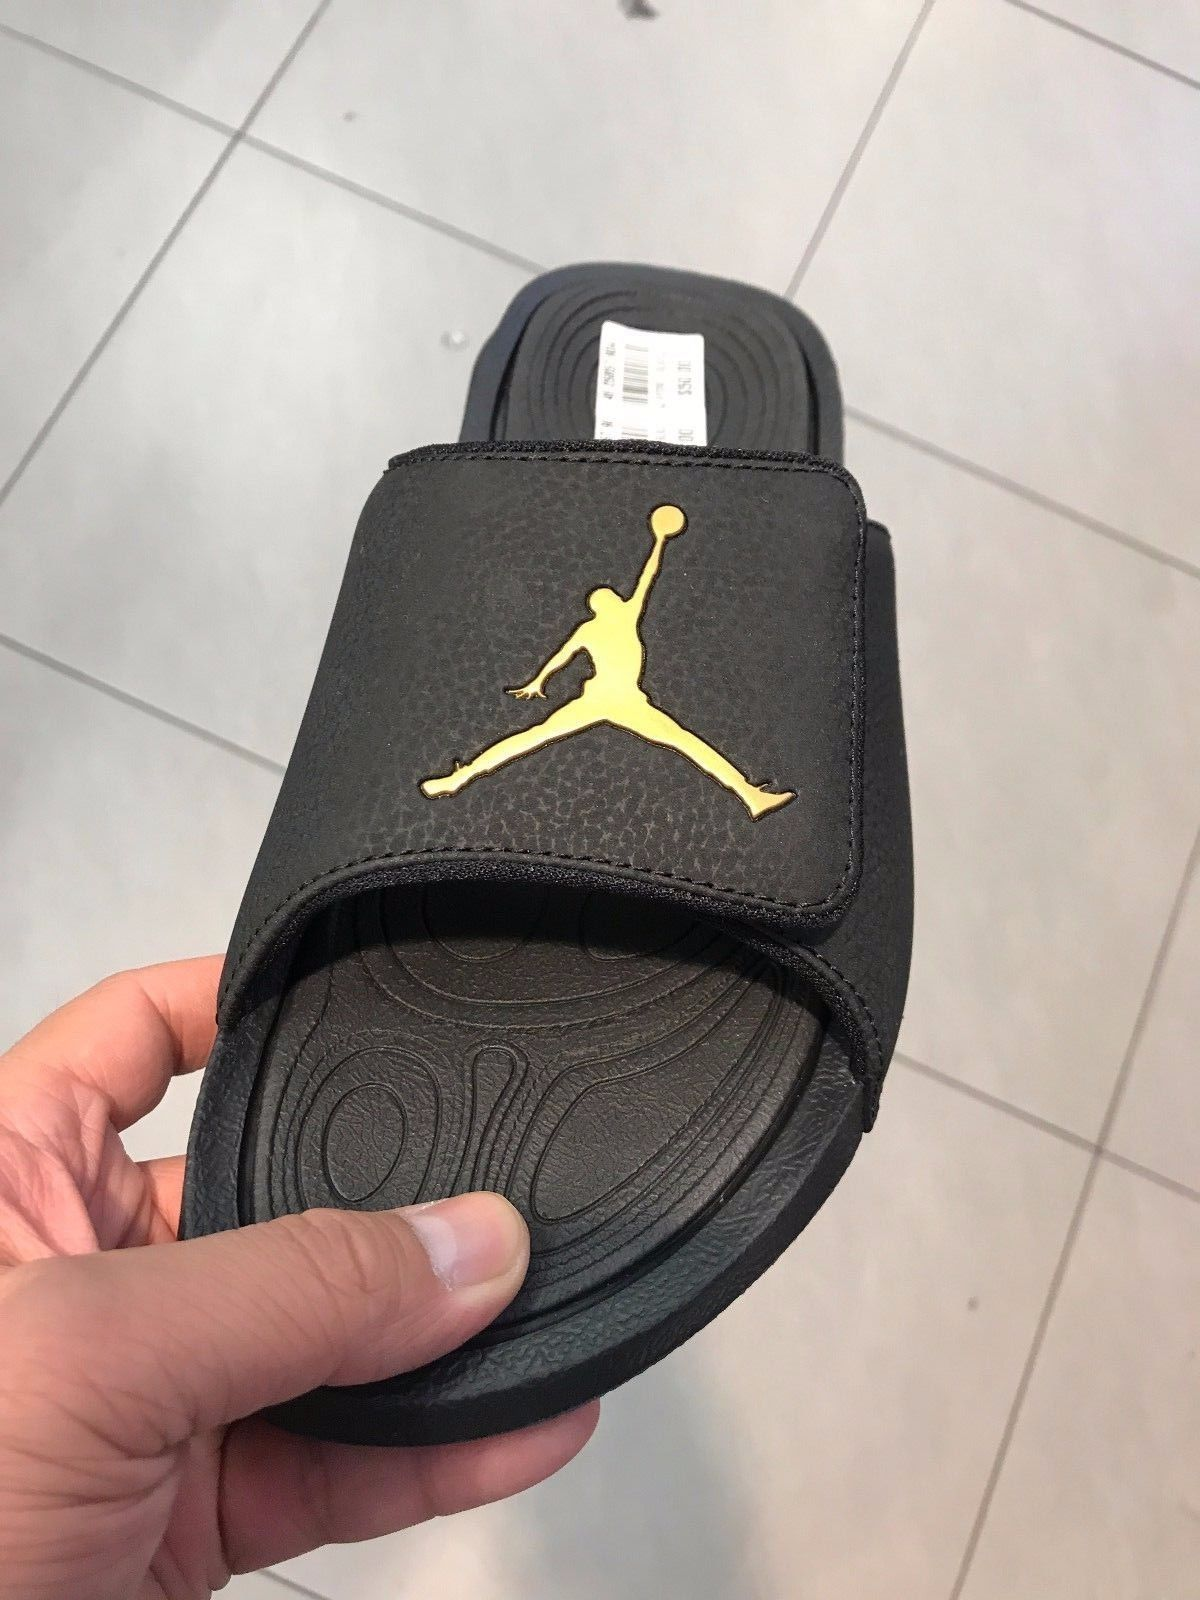 9d9d957b8ed5f6 Details about Nike Jordan Hydro 7 V2 Black Gold Men Sports Sandals ...